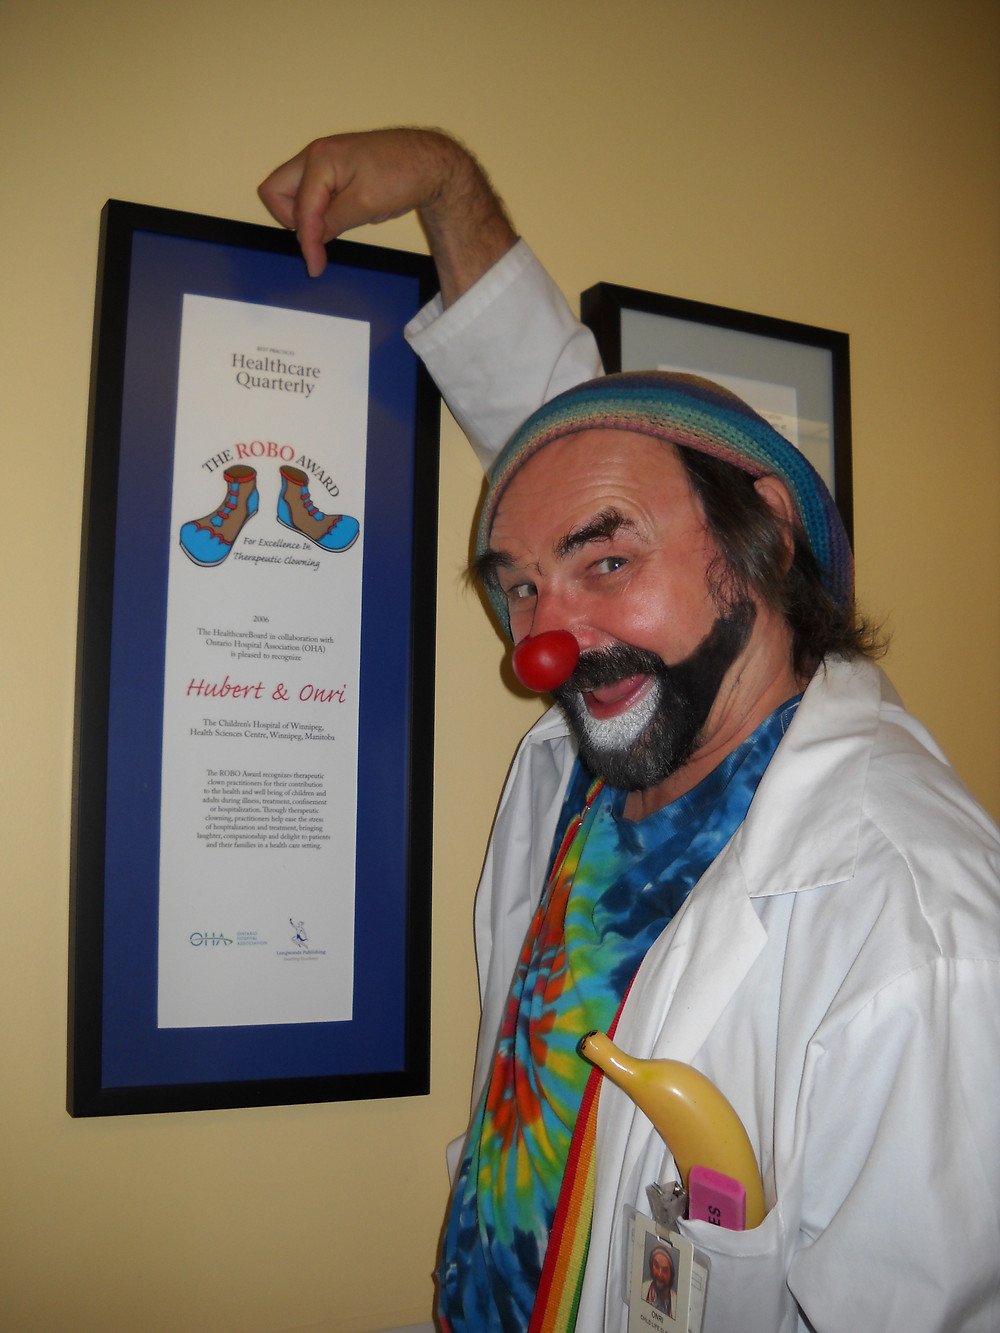 Onri with the Robo Award (credit:David Langdon)